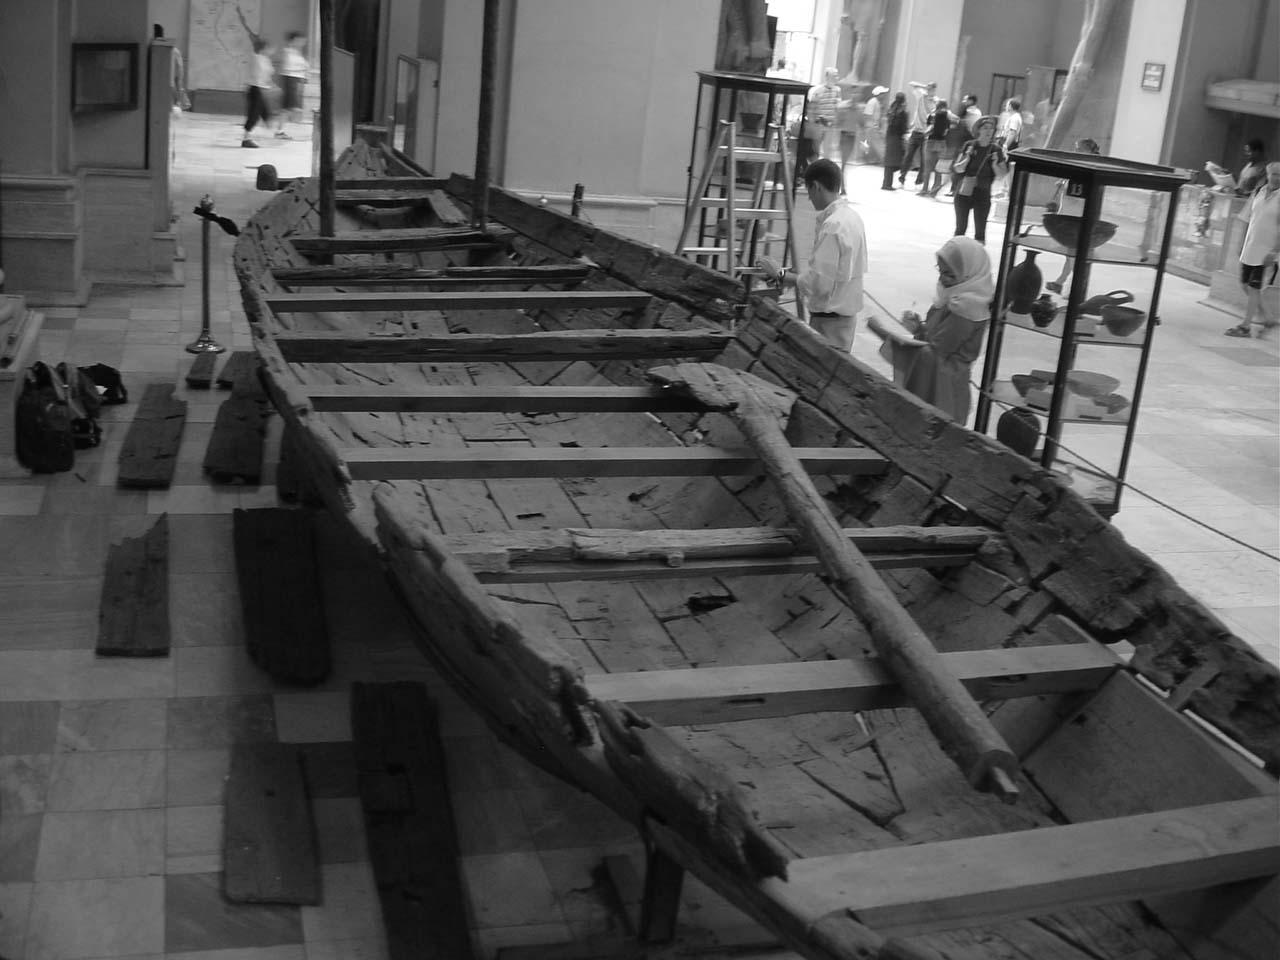 Cairo Dahshur Boat GC 4925